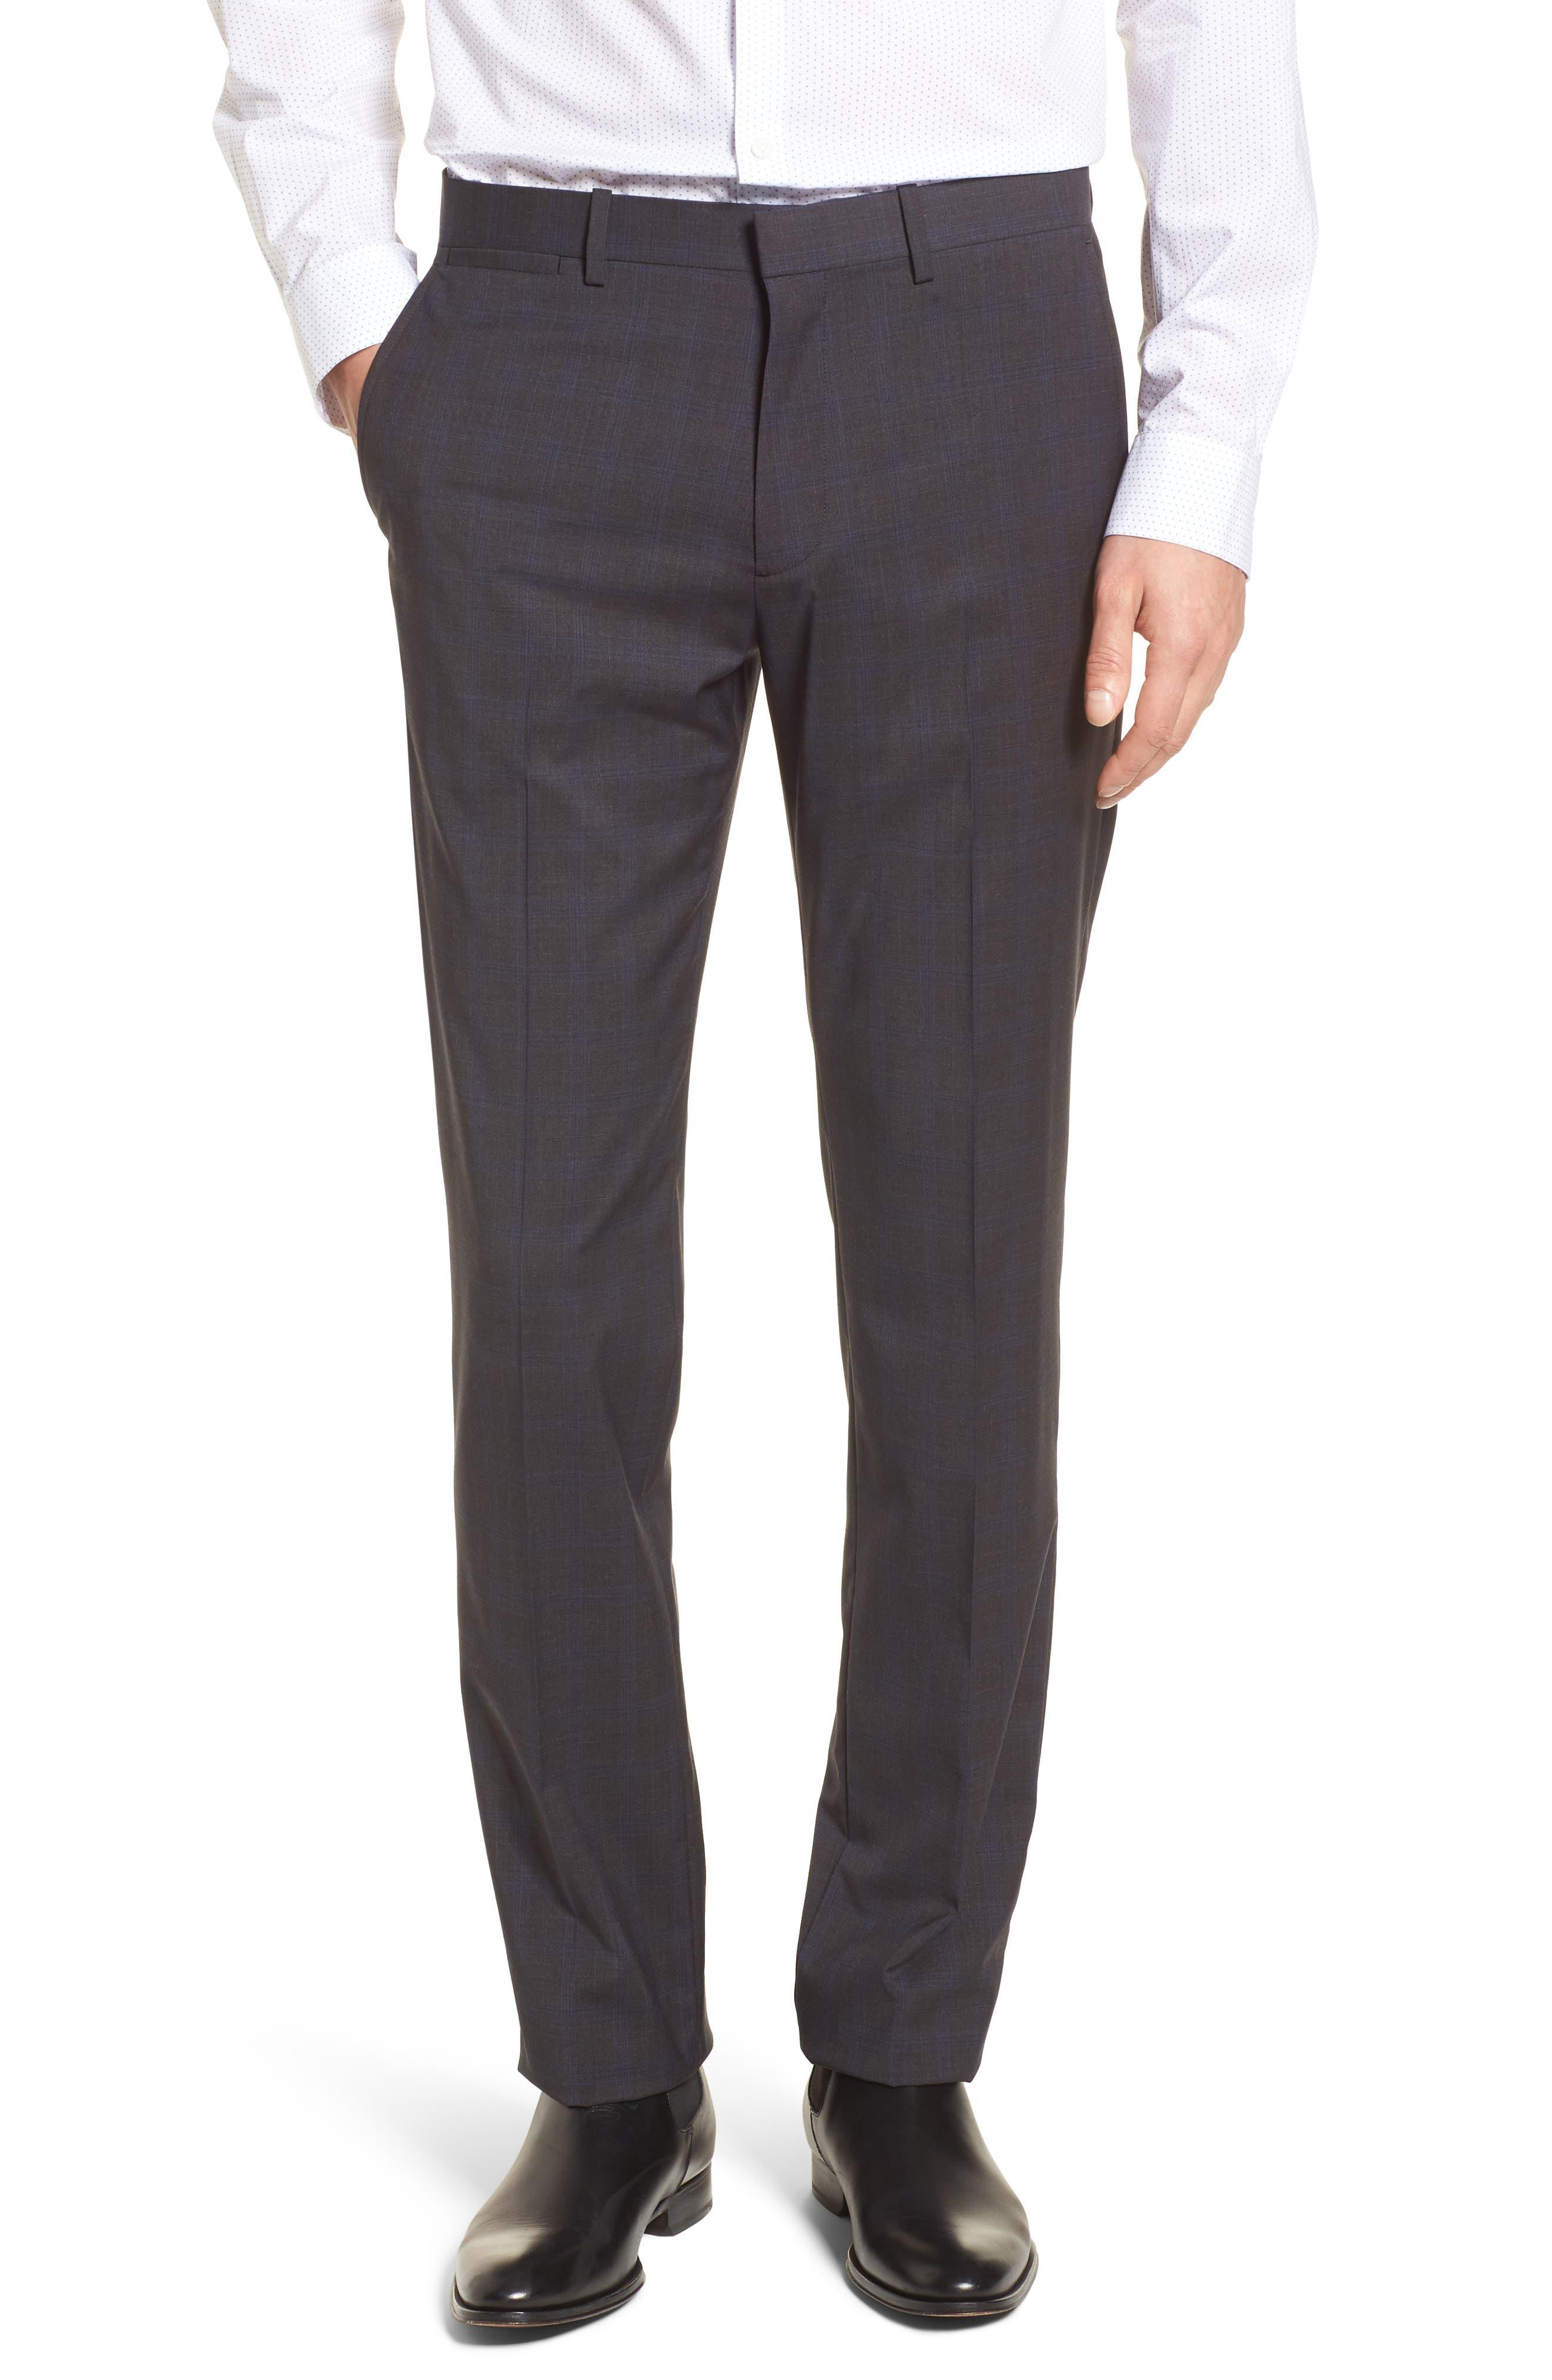 Marlo Trim Fit Tonal Plaid Trousers,                             Main thumbnail 1, color,                             053